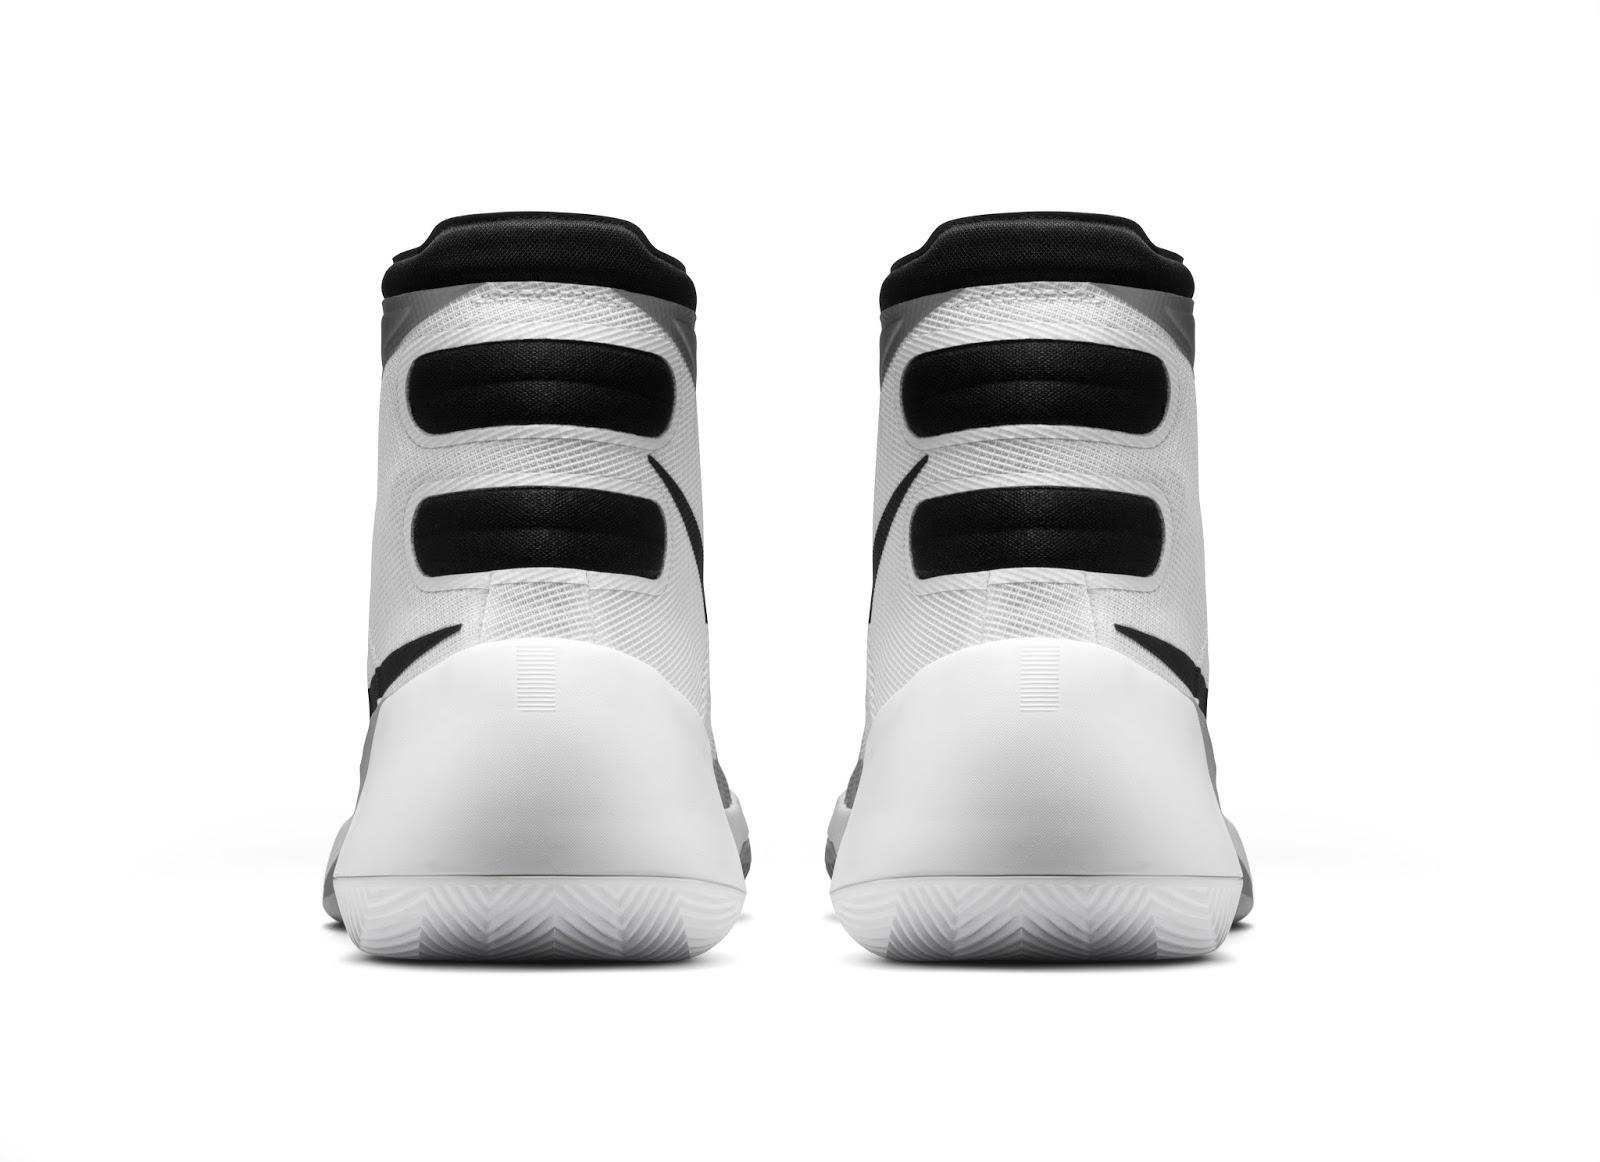 The Nike Hyperdunk 2015 shoe features the brand\u0027s top performance  technology and a striking, cutting-\u2010edge silhouette. Leo Chang, Nike  Basketball\u0027s Footwear ...